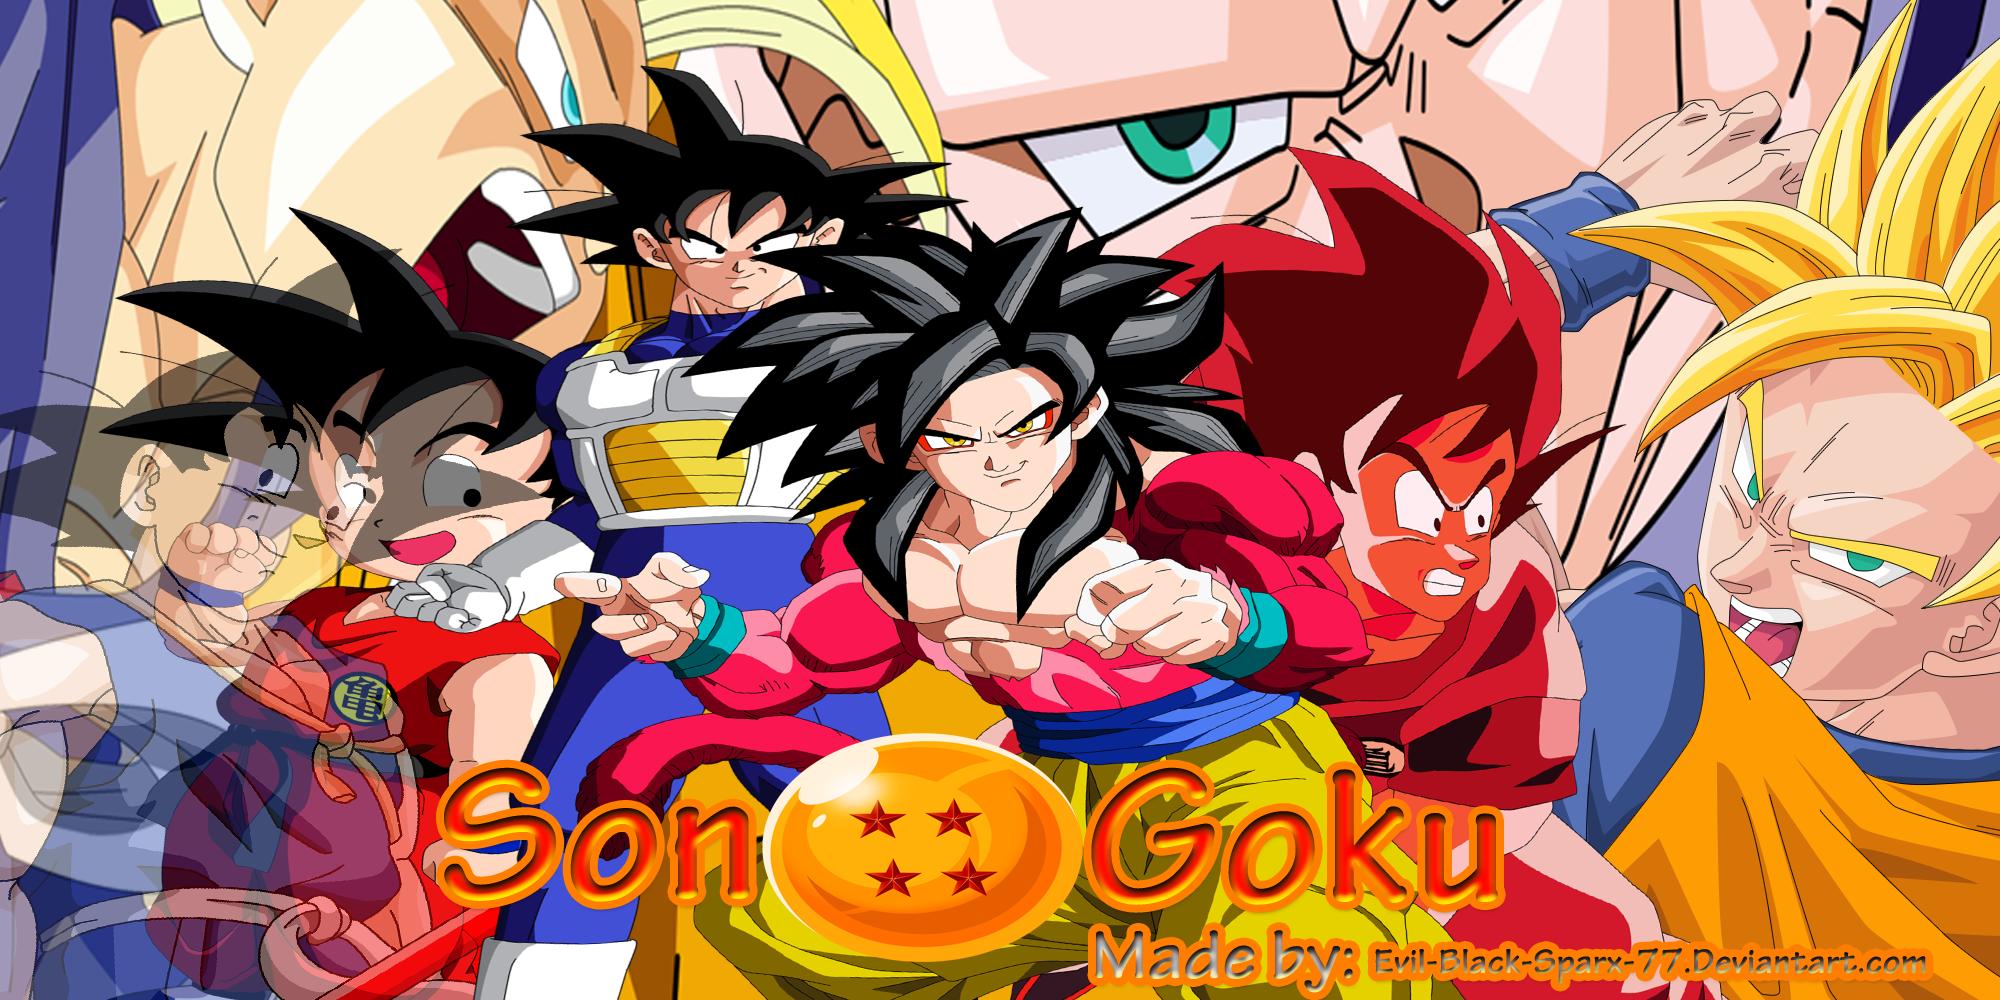 Google chrome themes dragon ball z - Son Goku Chrome Theme By Evil Black Sparx 77